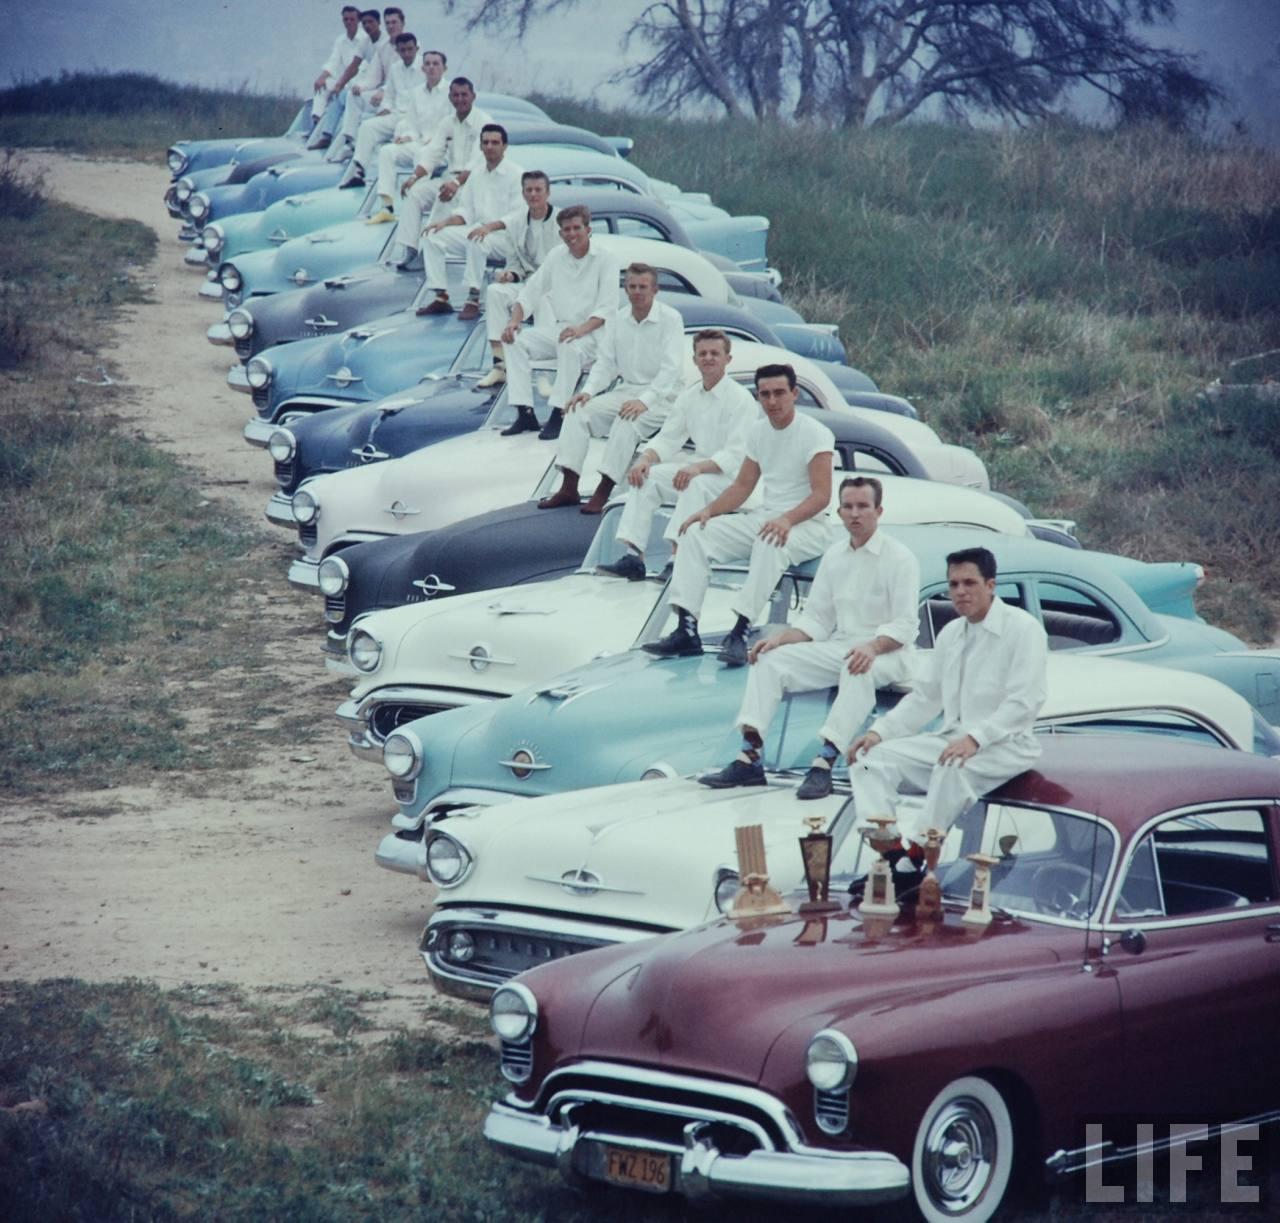 1960. National Hot Rod Association's (NHRA) Drag Racing találkozó Santa Ana, California..jpg